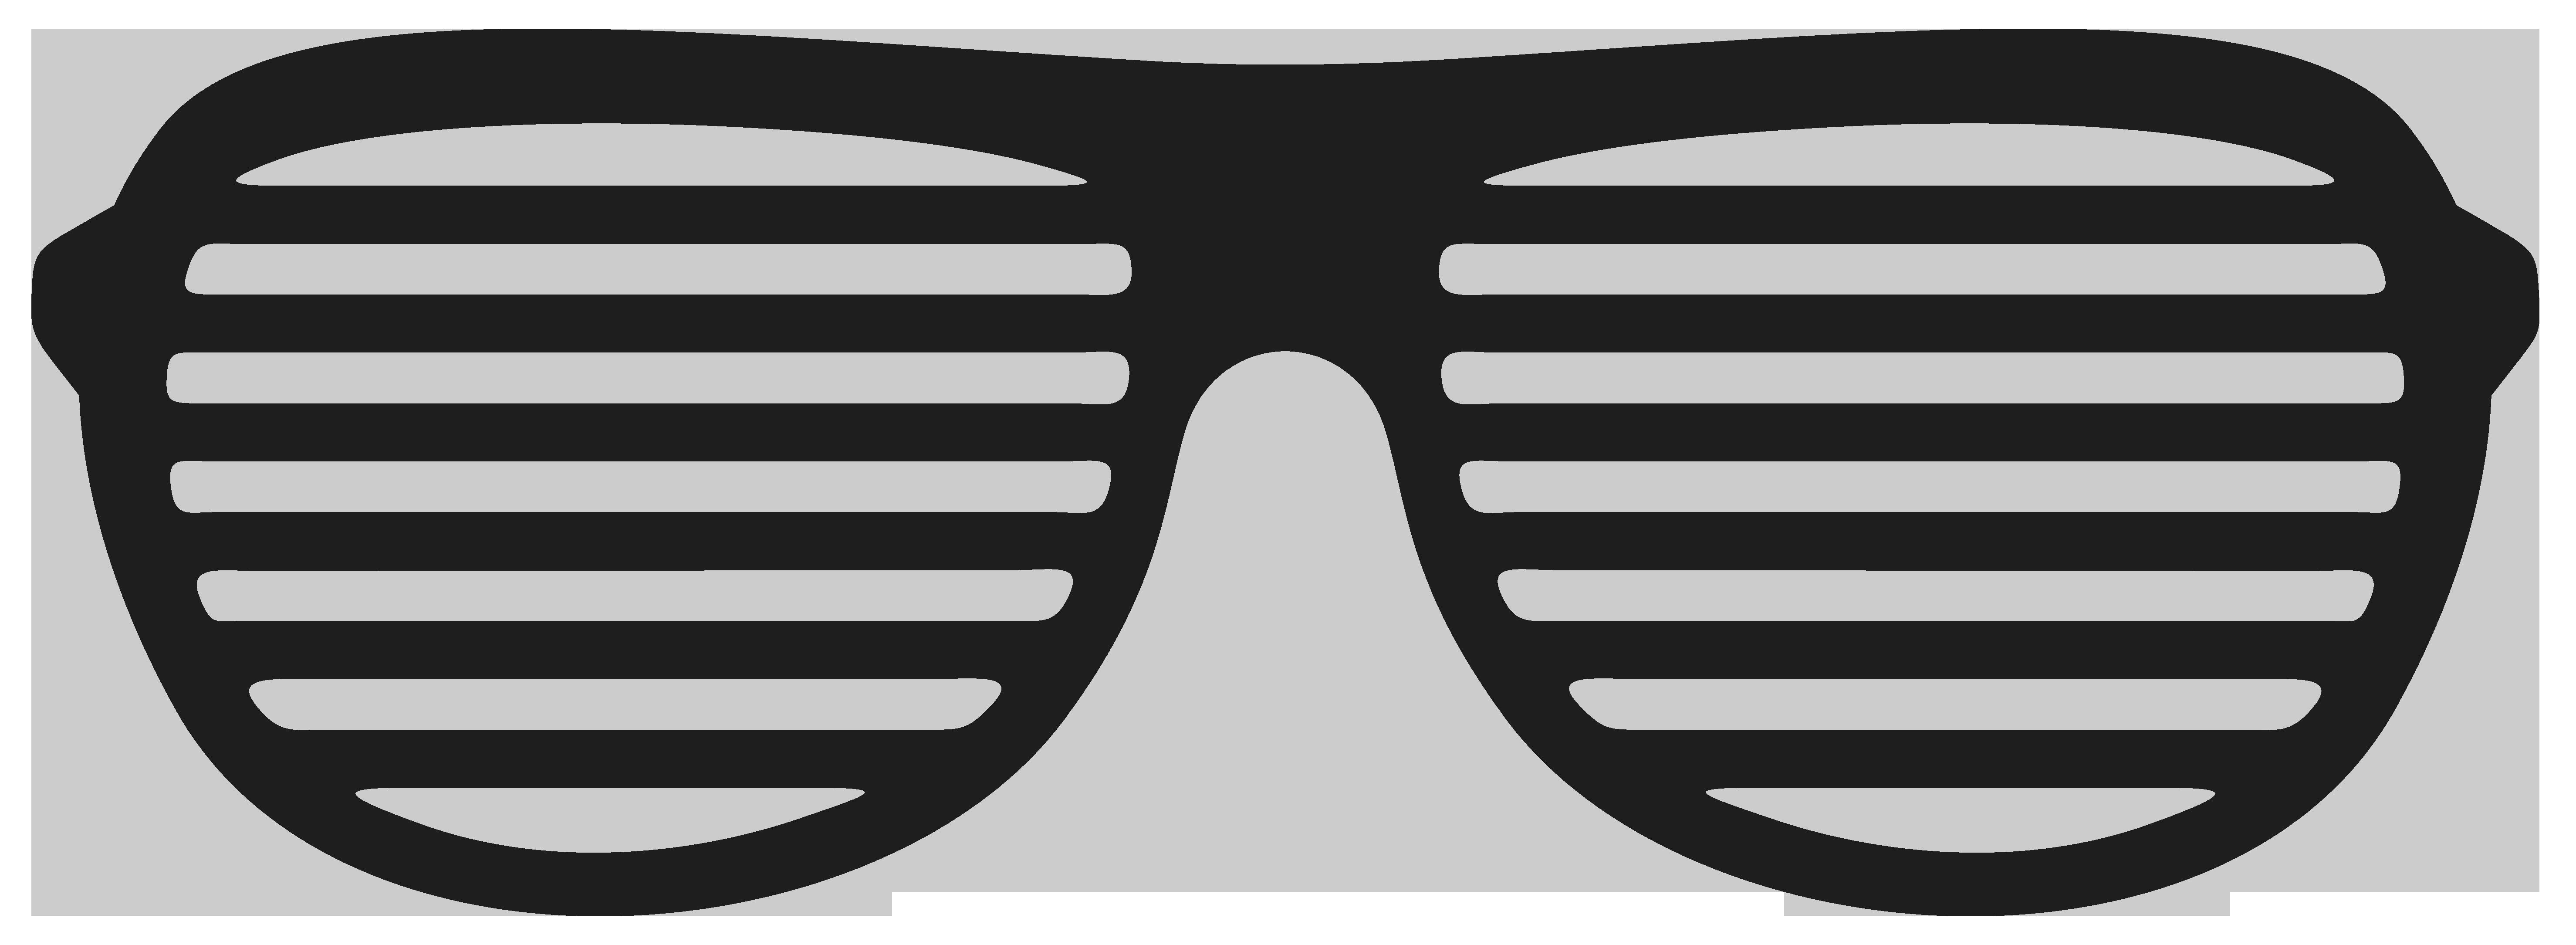 Shutter shades Sunglasses Stock illustration Clip art - Movember ... freeuse stock